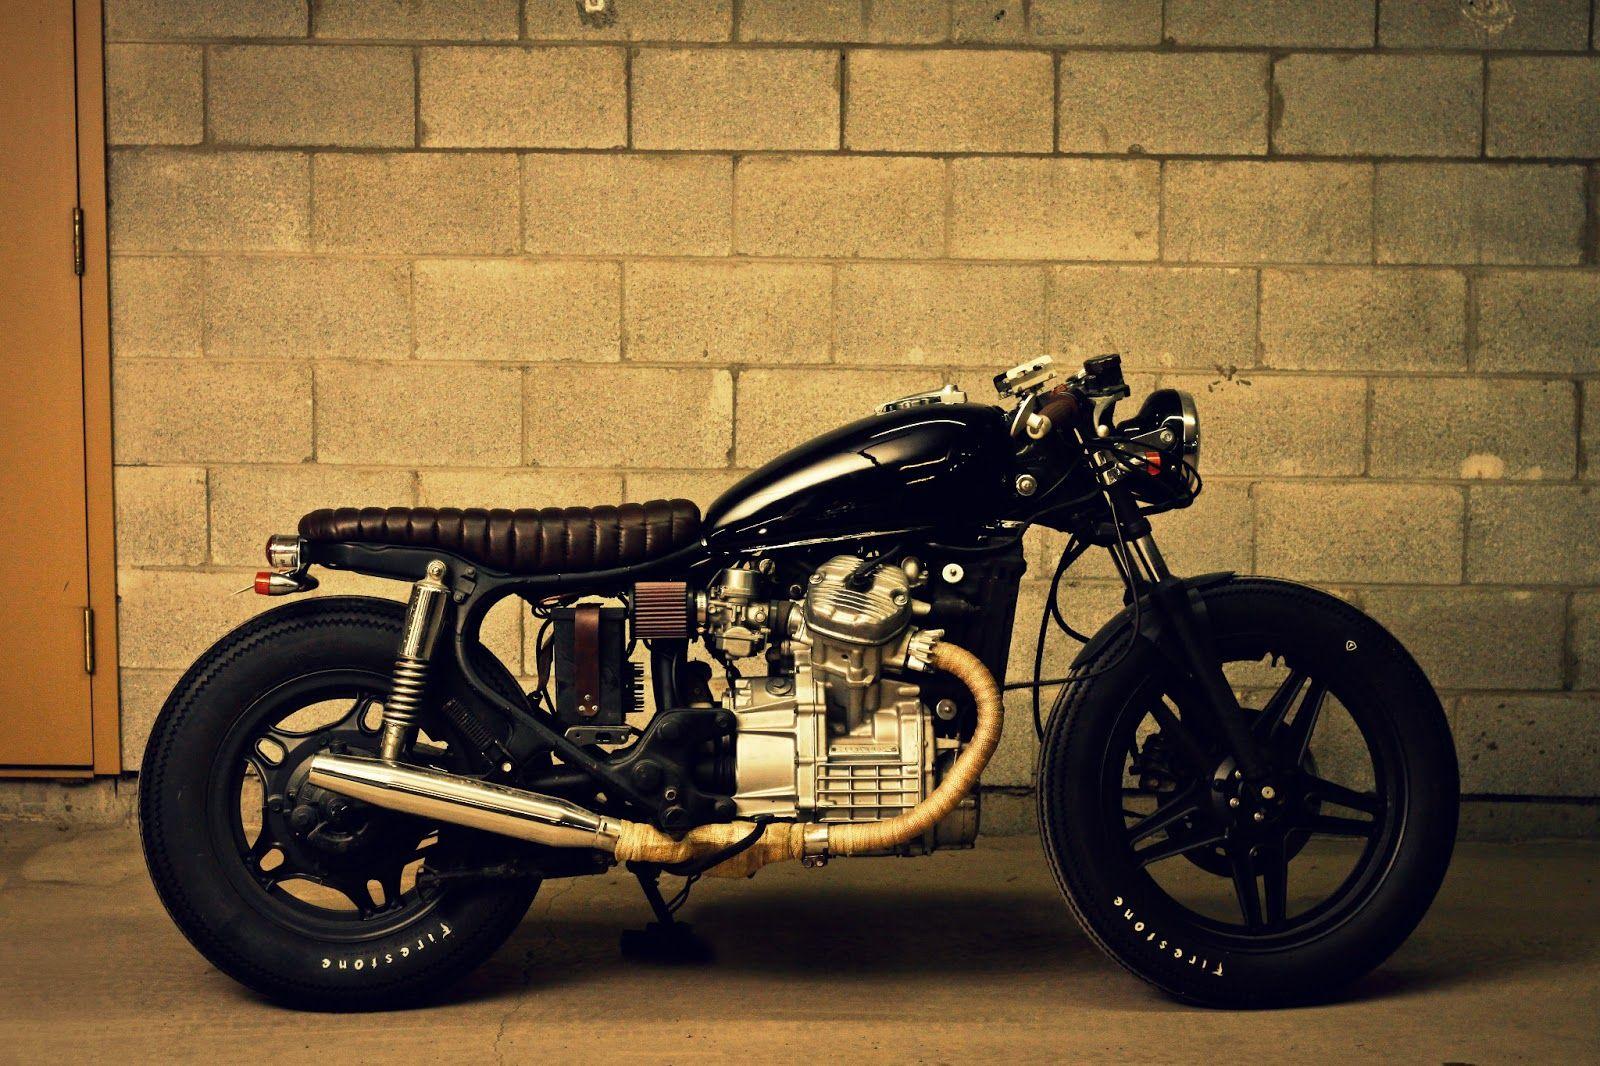 Moto Mucci DAILY INSPIRATION Jonath Forgets 1979 Honda CX500 Custom